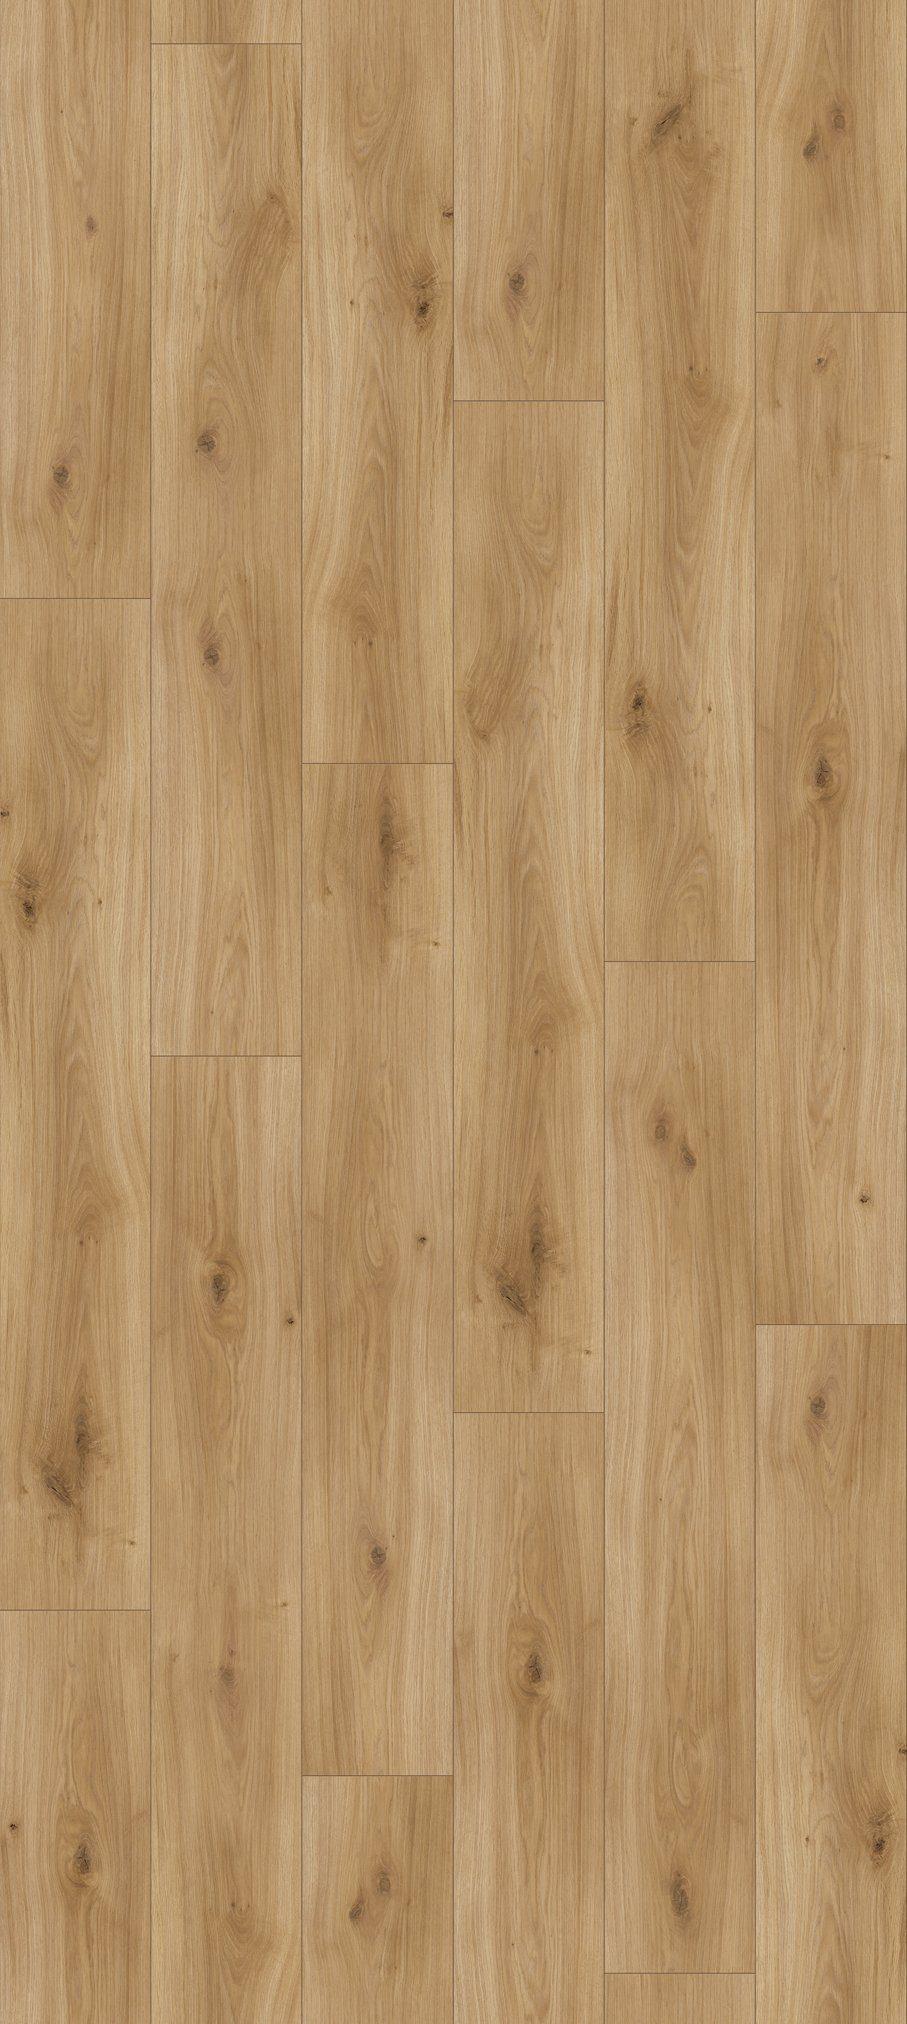 PARADOR Laminat »Basic 200 - Eiche Horizont Natur«, 1285 x 194 mm, Stärke: 7 mm